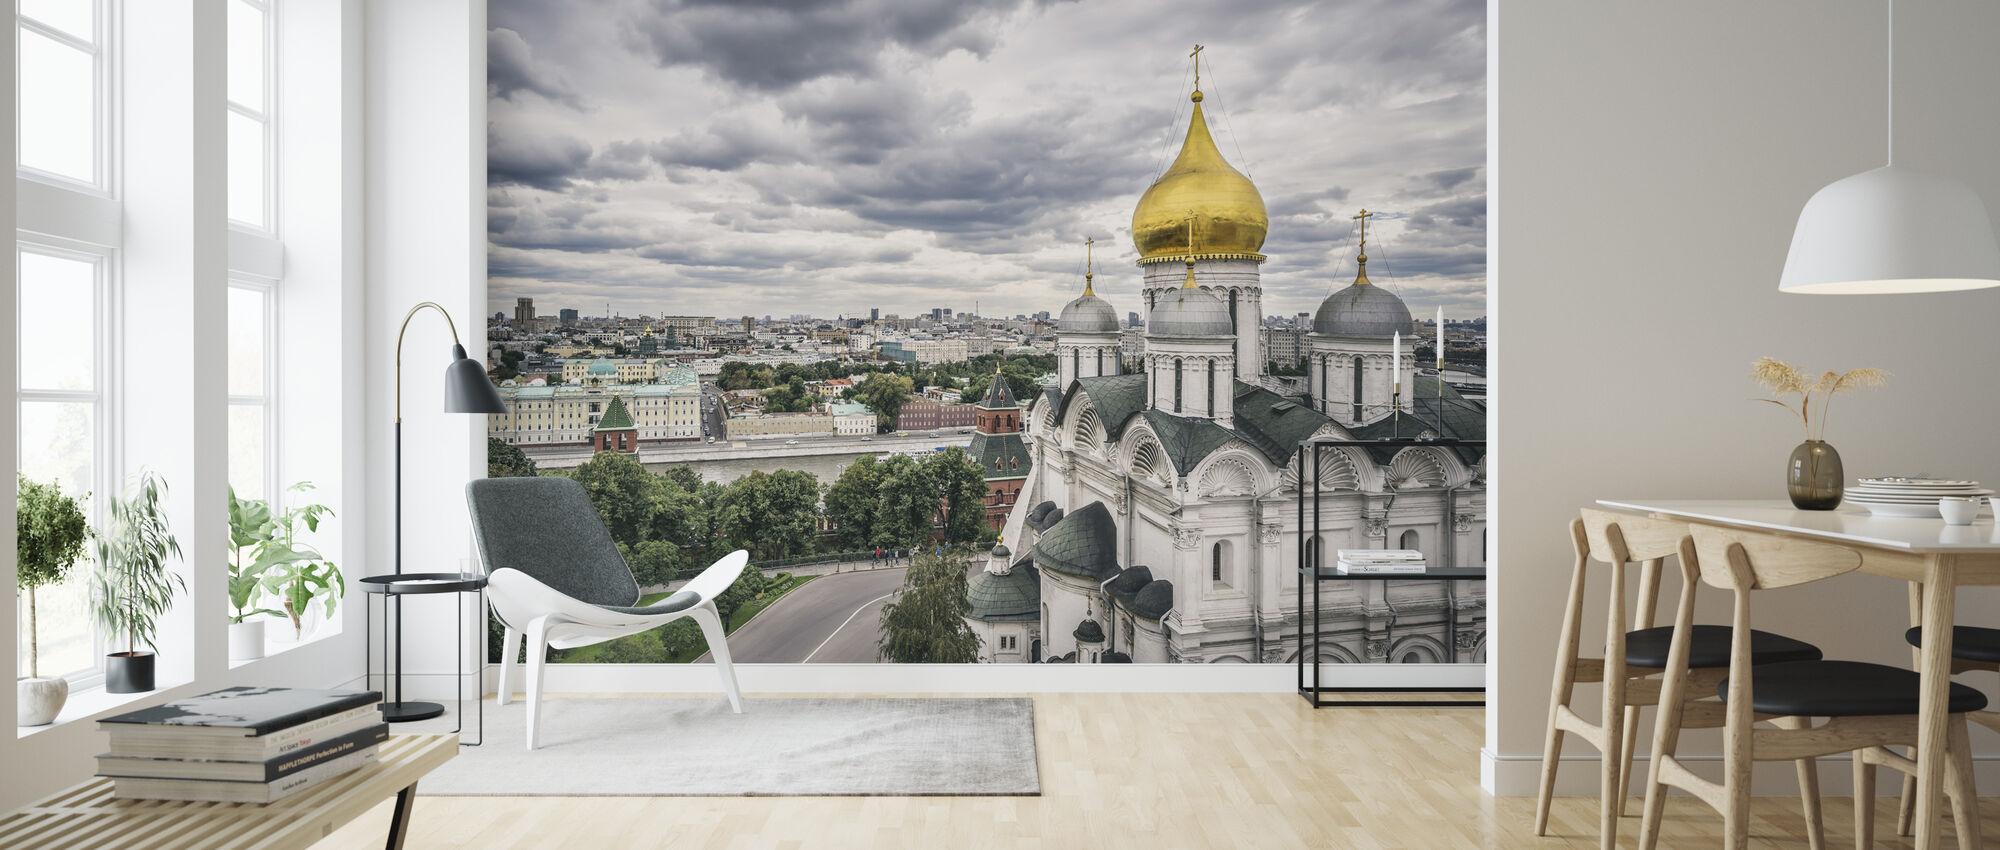 Grey Sky over Kremlin - Wallpaper - Living Room